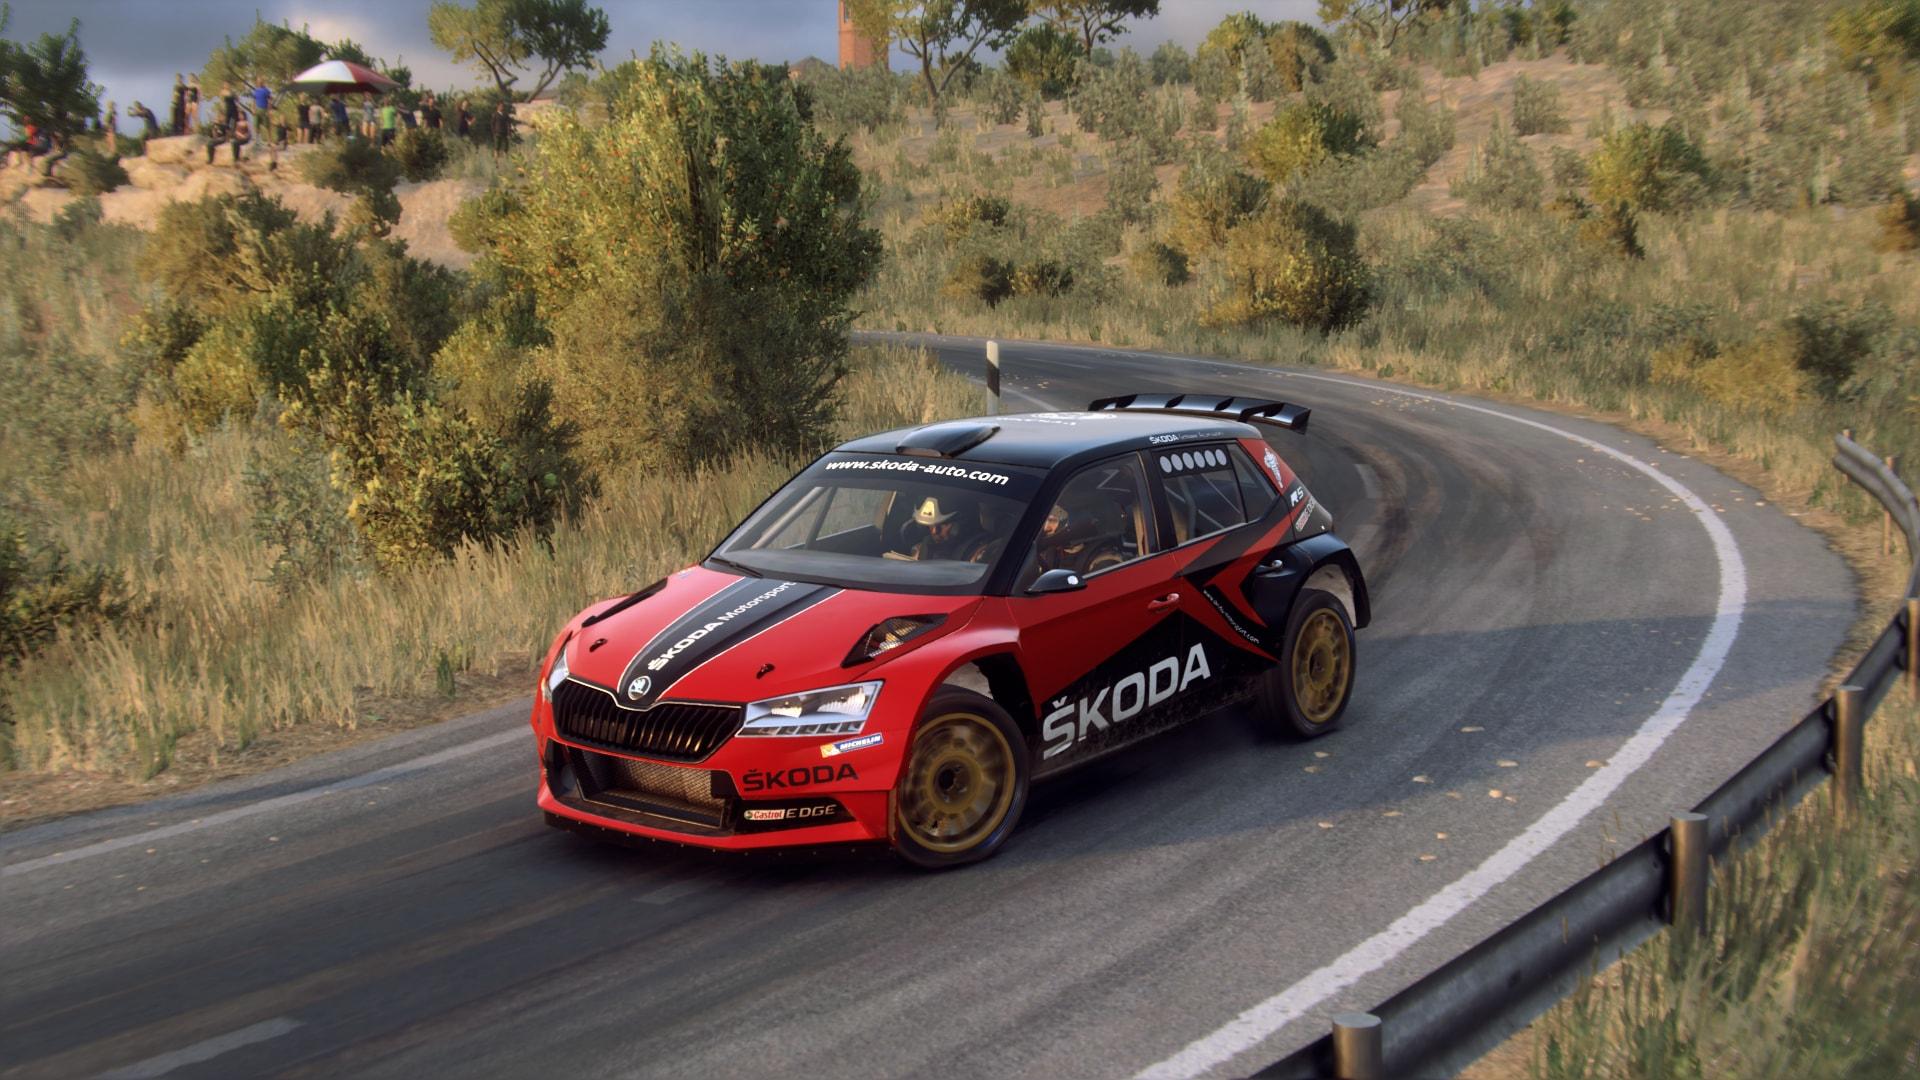 Skoda Fabia R5 Racedepartment